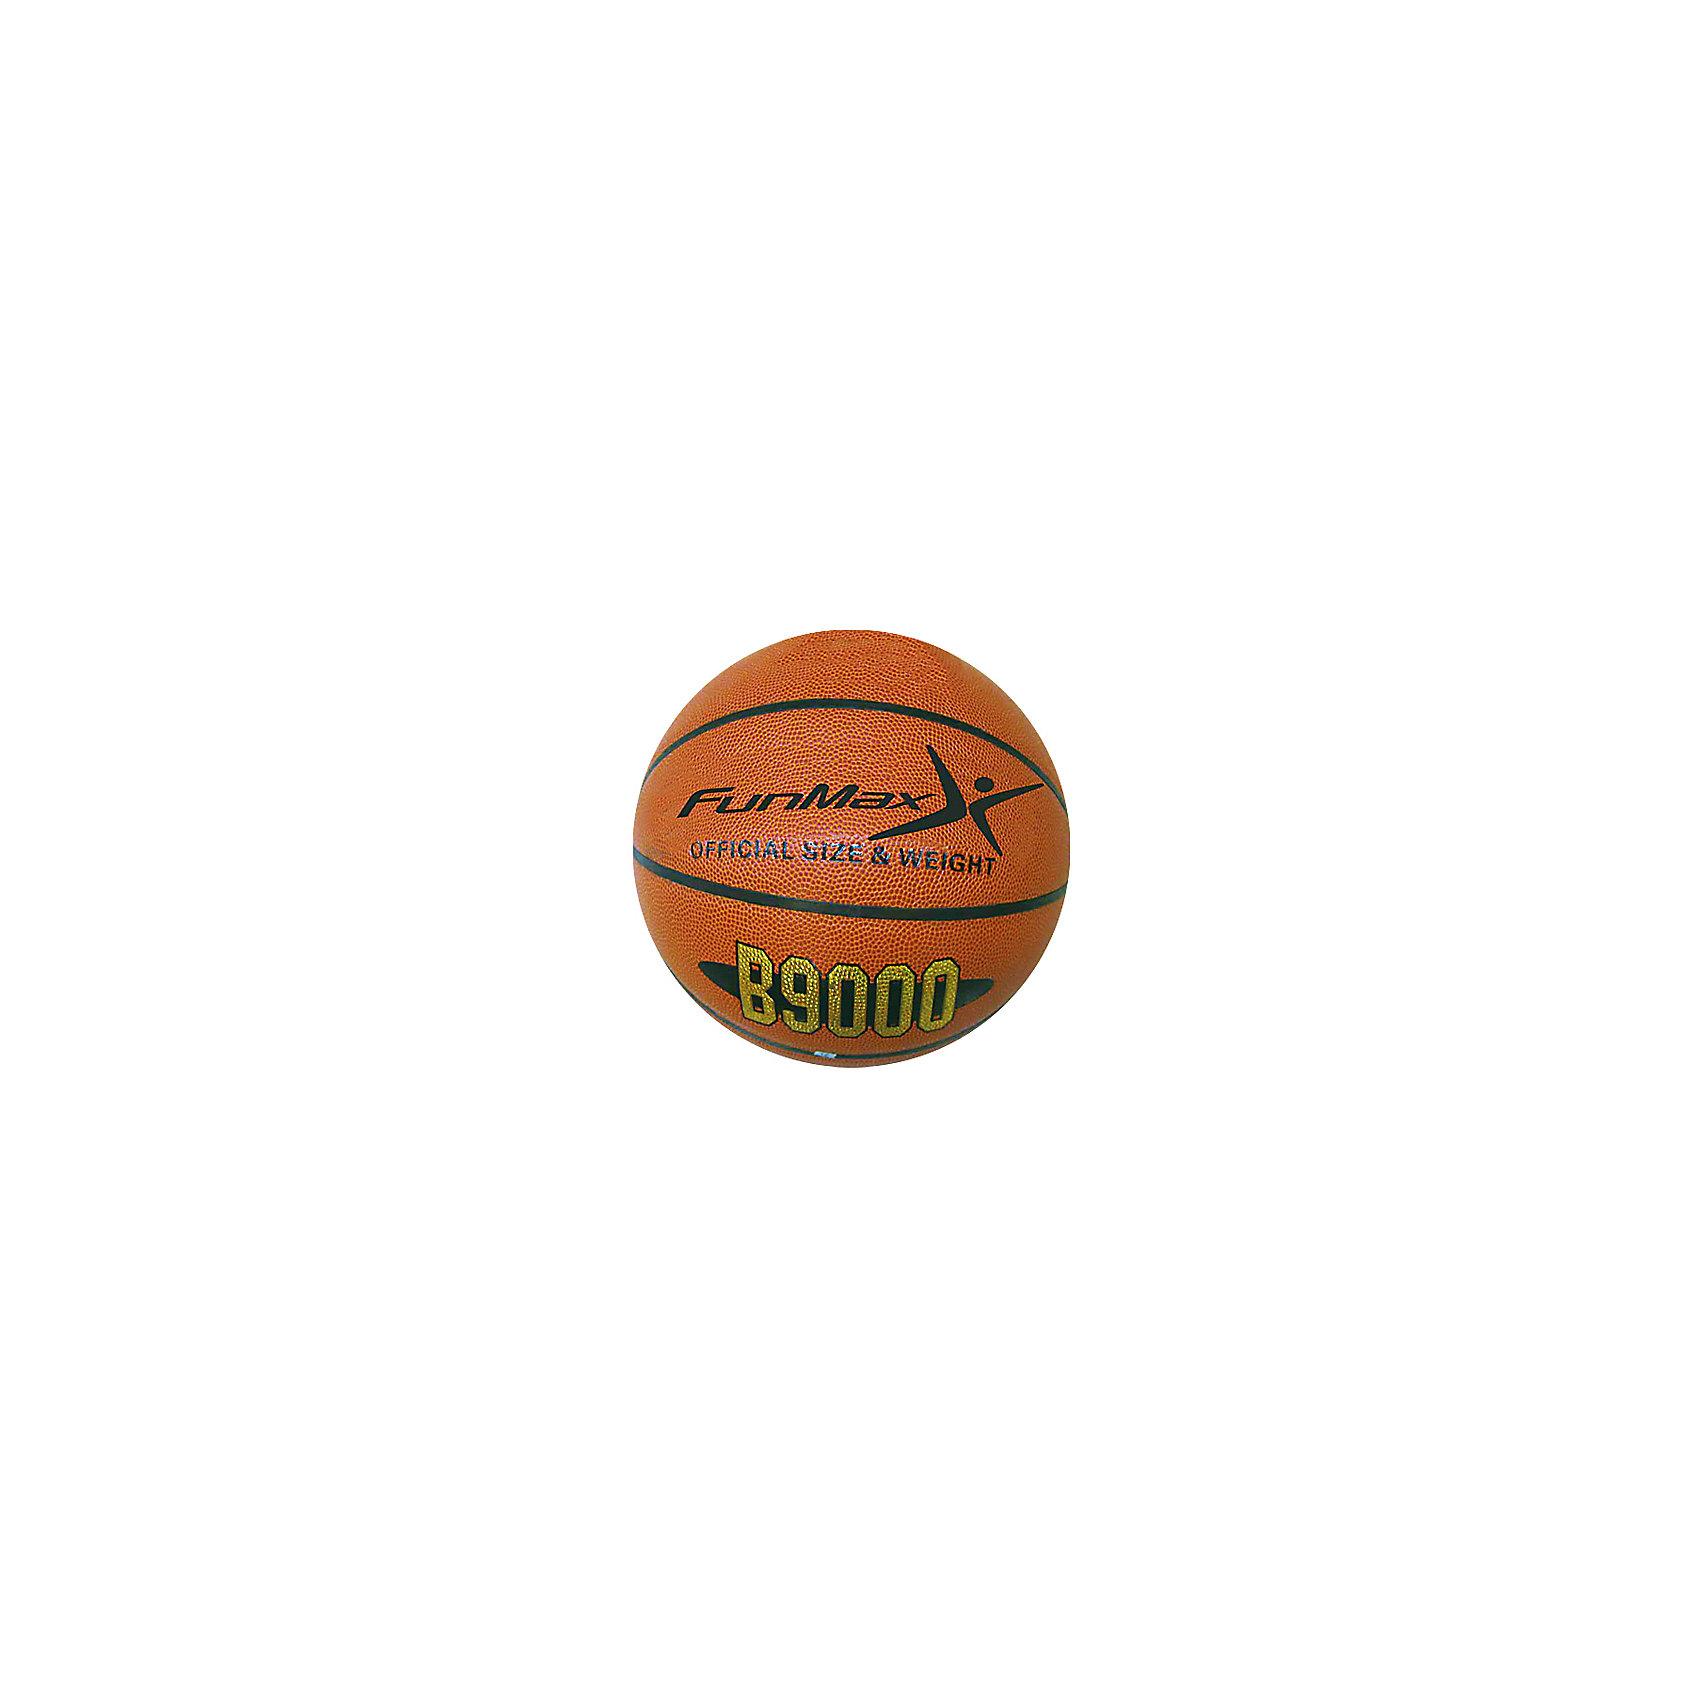 - Баскетбольный мяч, FunMax мяч баскетбольный jogel цвет коричневый размер 7 jb 700